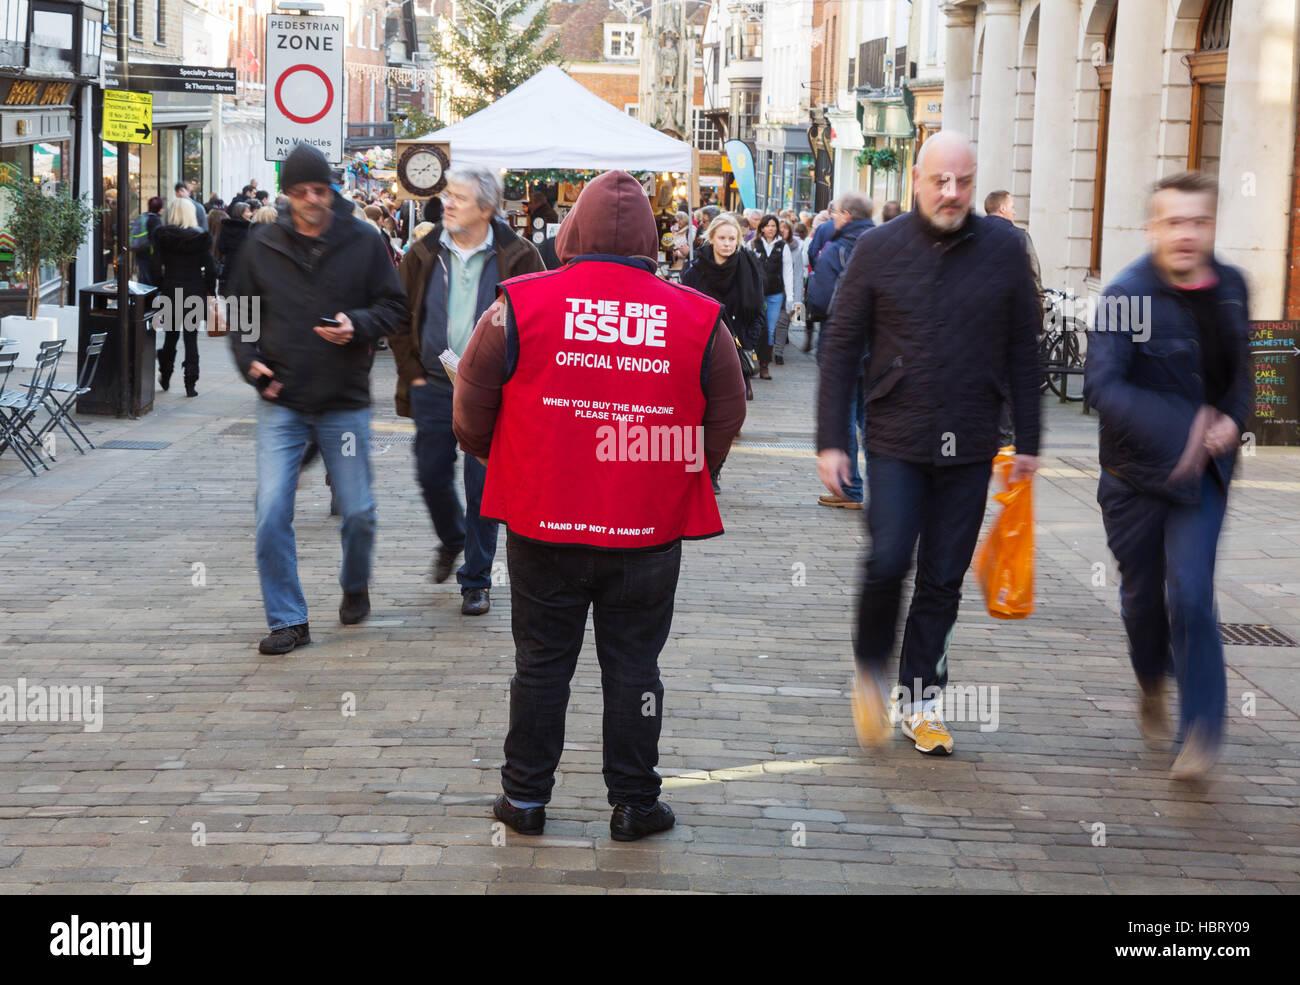 People walking past a Big Issue magazine vendor, Winchester, Hampshire, UK - Stock Image